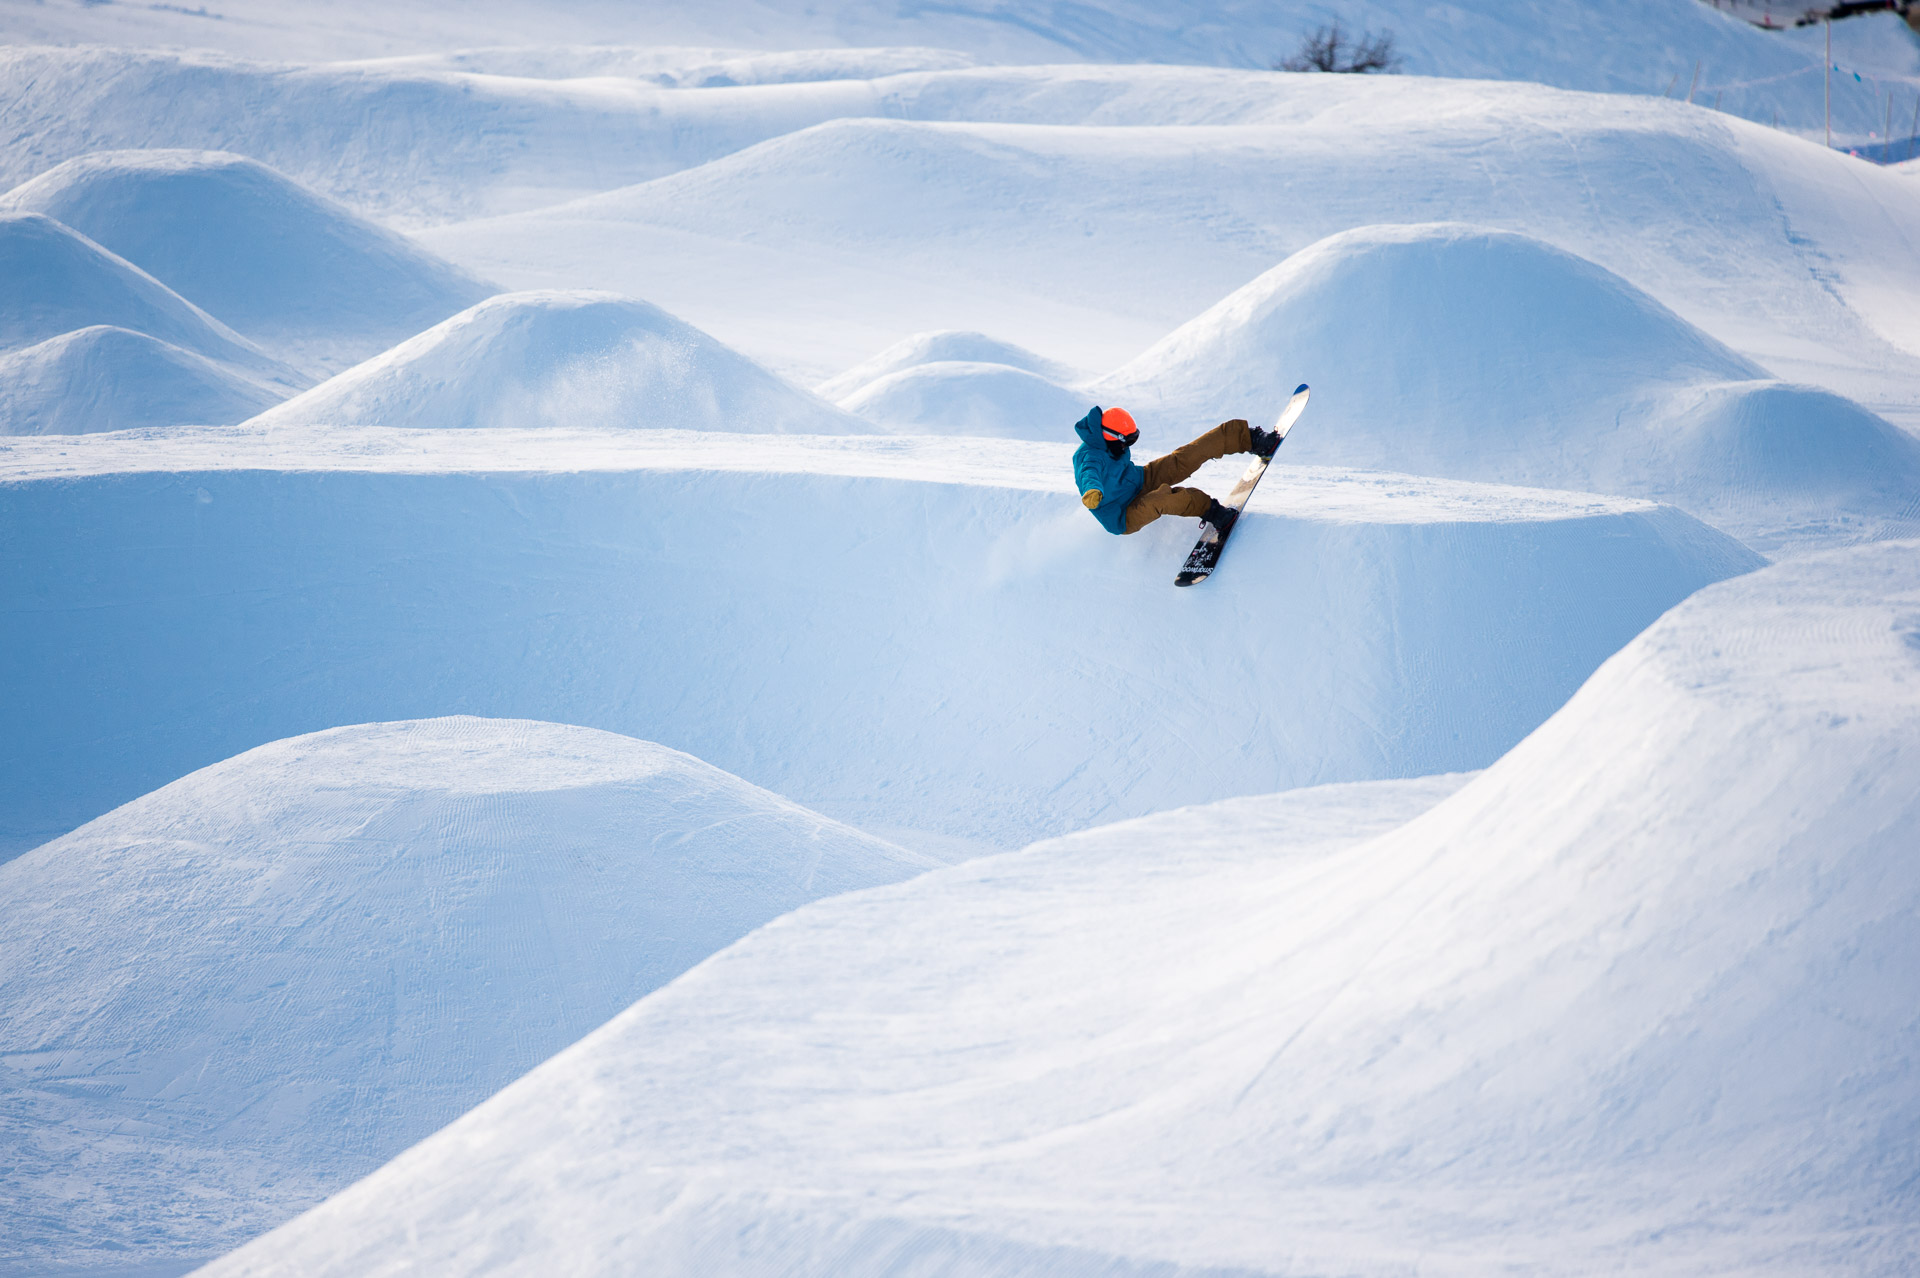 Blair Habenicht - Holy Bowly / Sunshine Village – Tim Zimmerman Photo